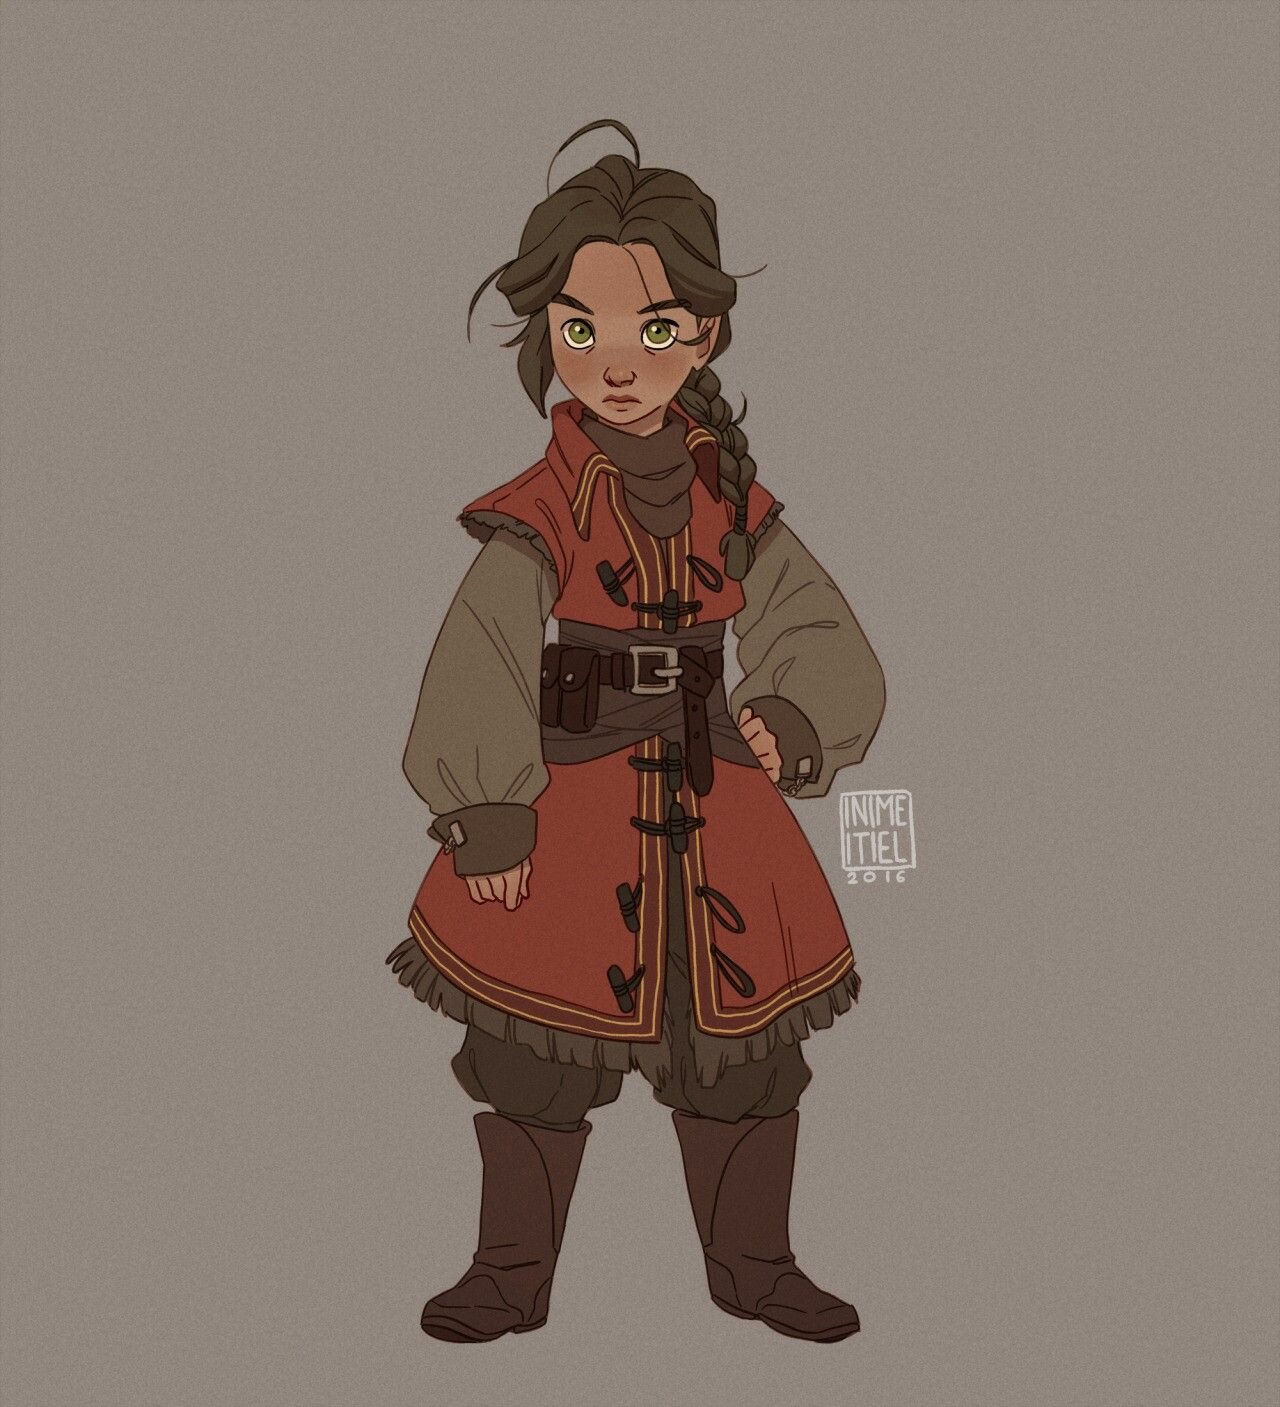 Character Design Dnd : Pin by pieterjan peere on dnd pinterest gnomes